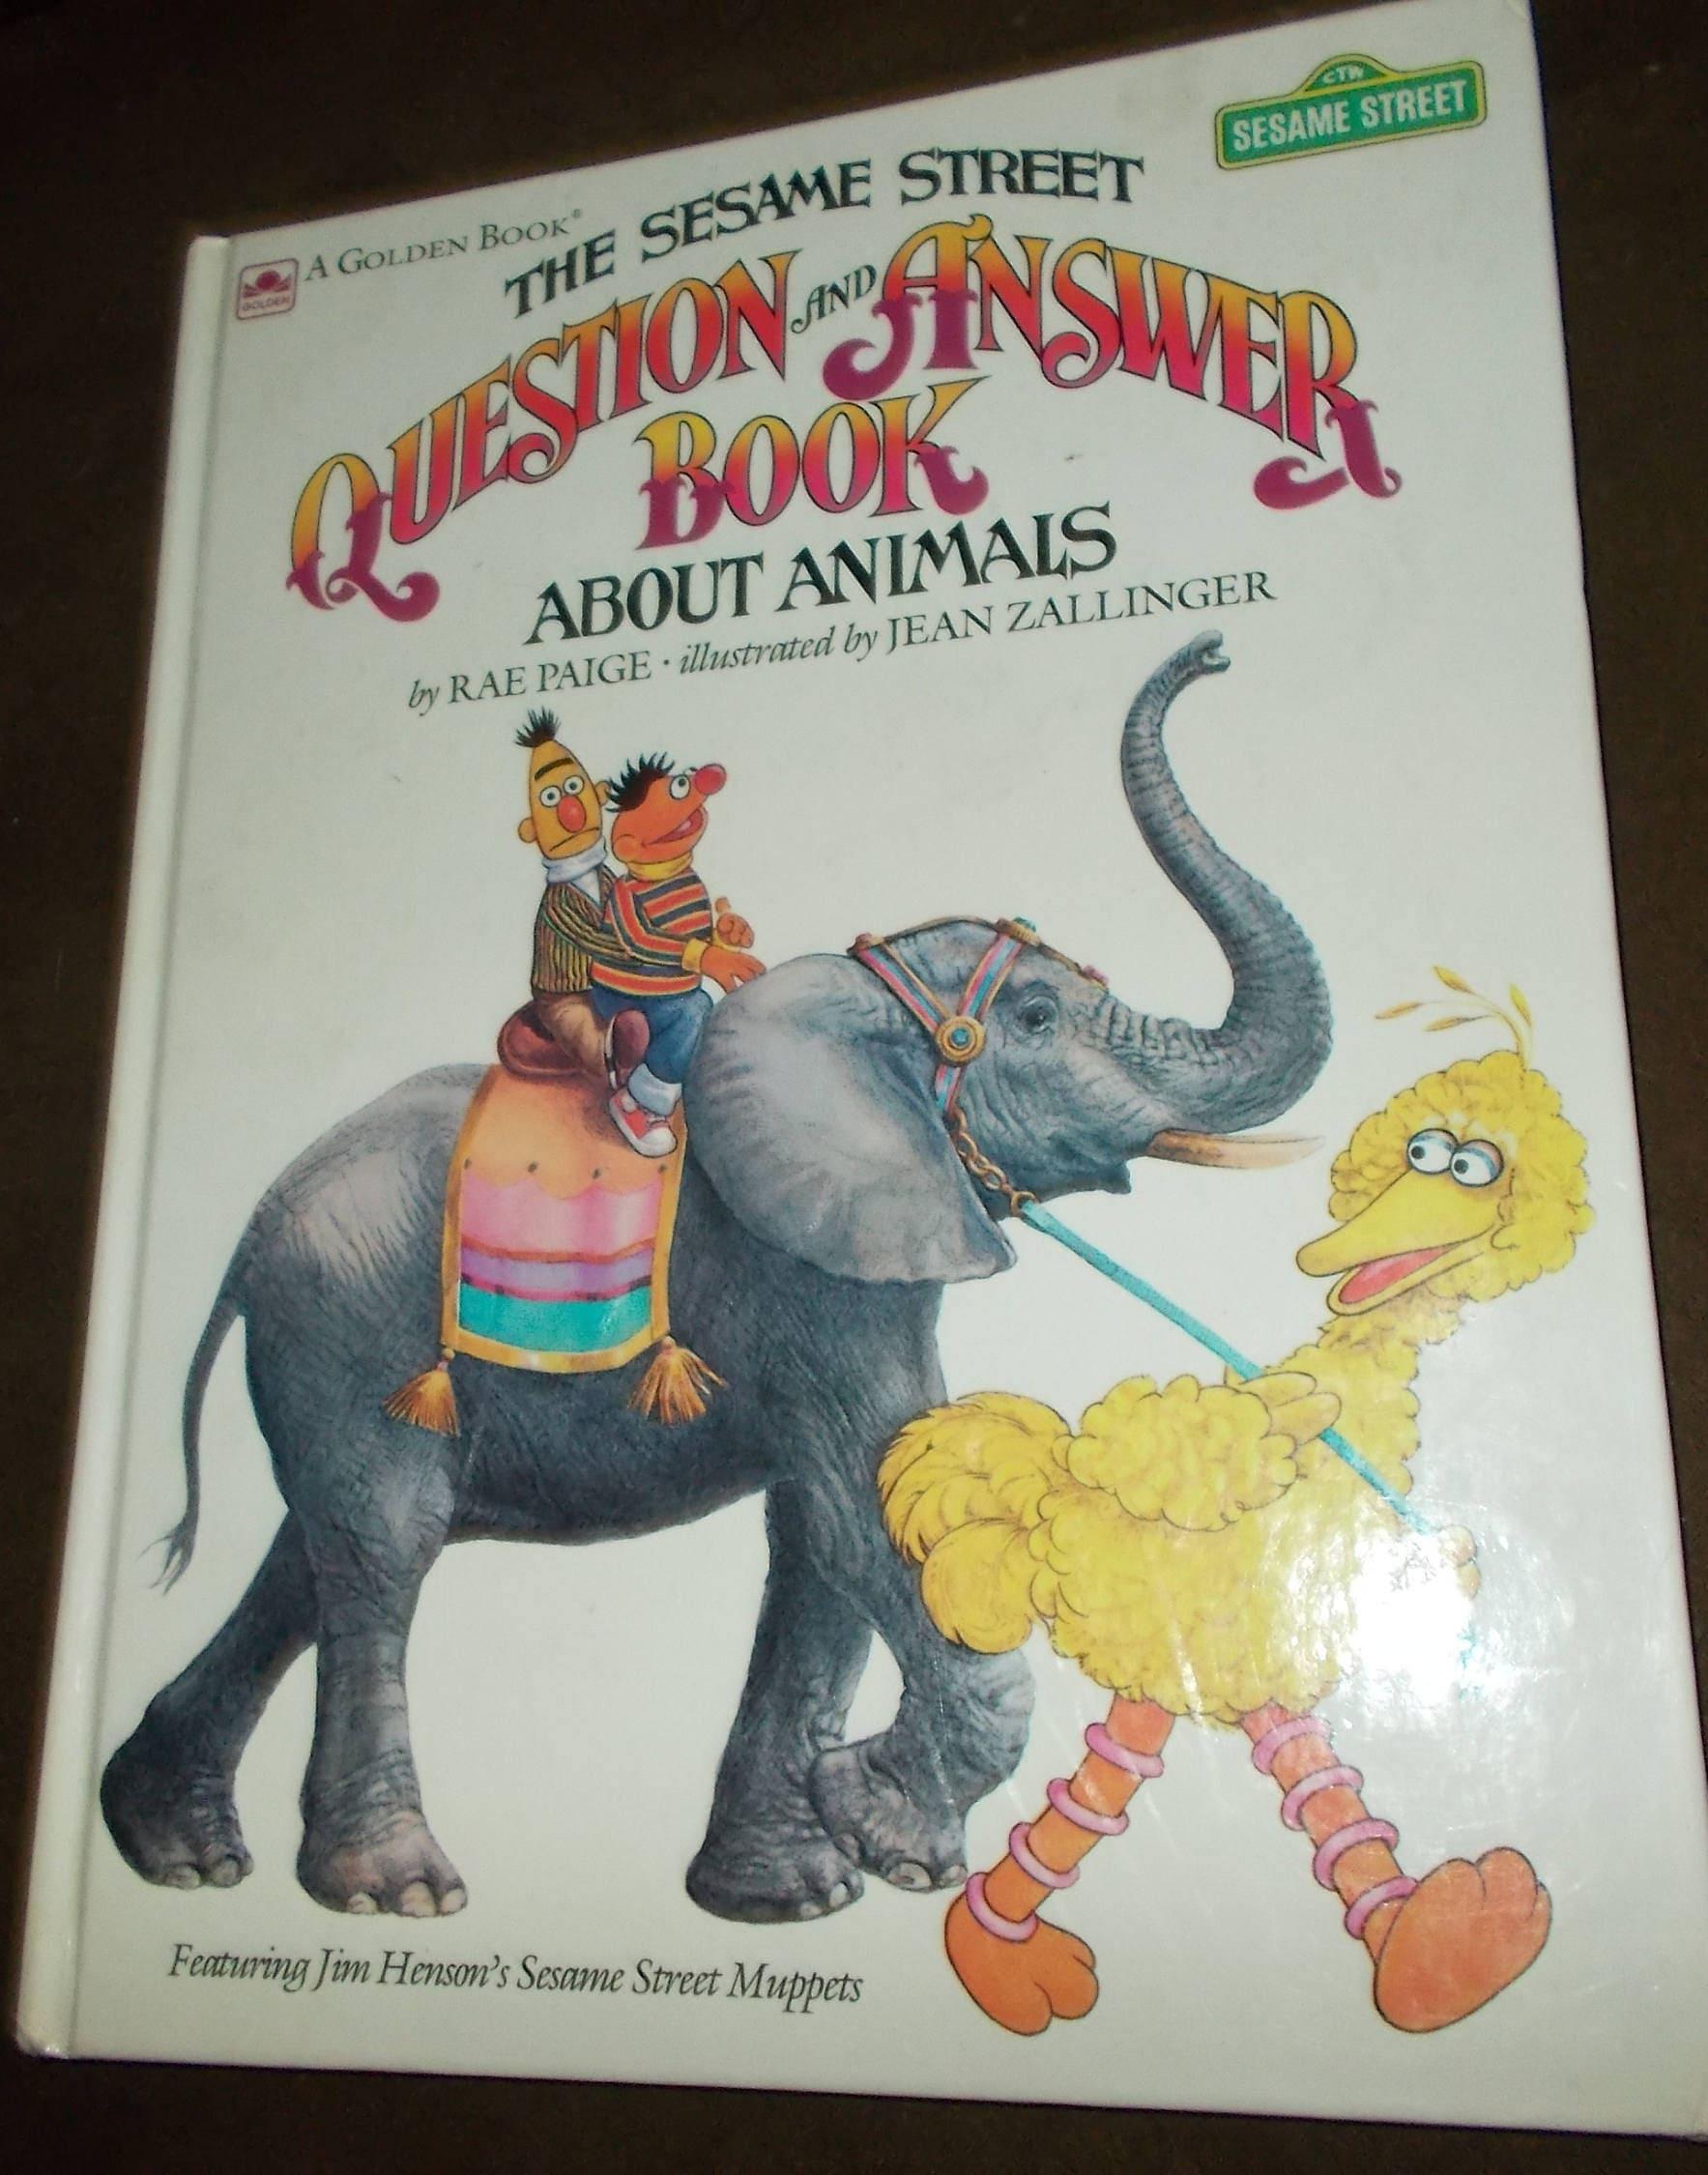 Sesame Street Animal Question & Answer Book Illustrated Jim Henson Big Bird  Muppets Childrens Book Vintage Golden Book